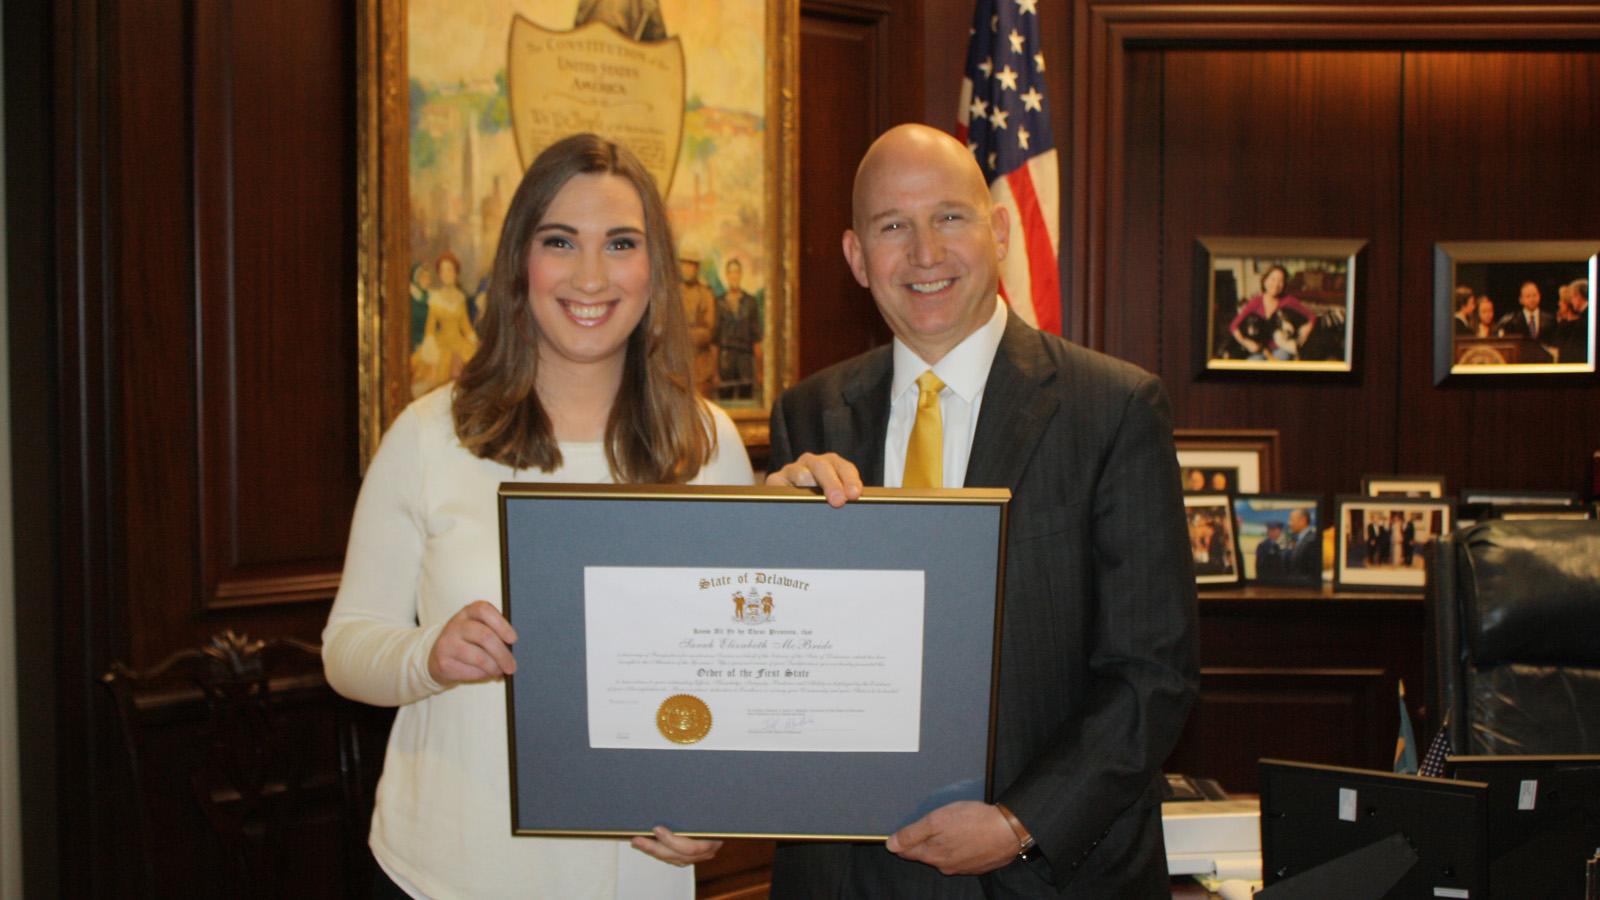 HRC's Sarah McBride Awarded Delaware's Highest Honor